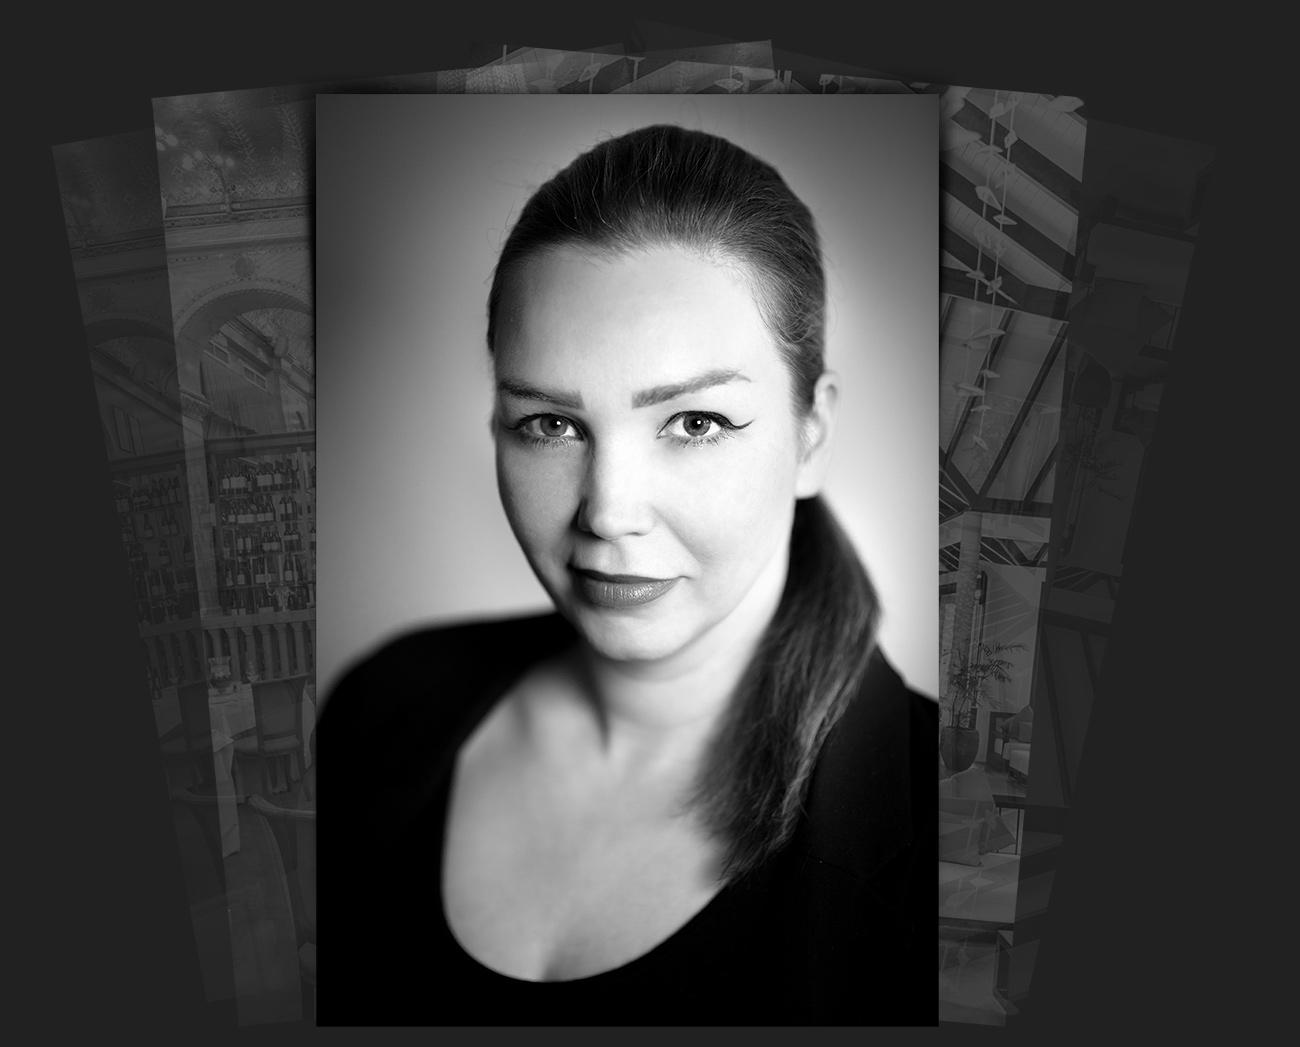 Melanie Görlitz